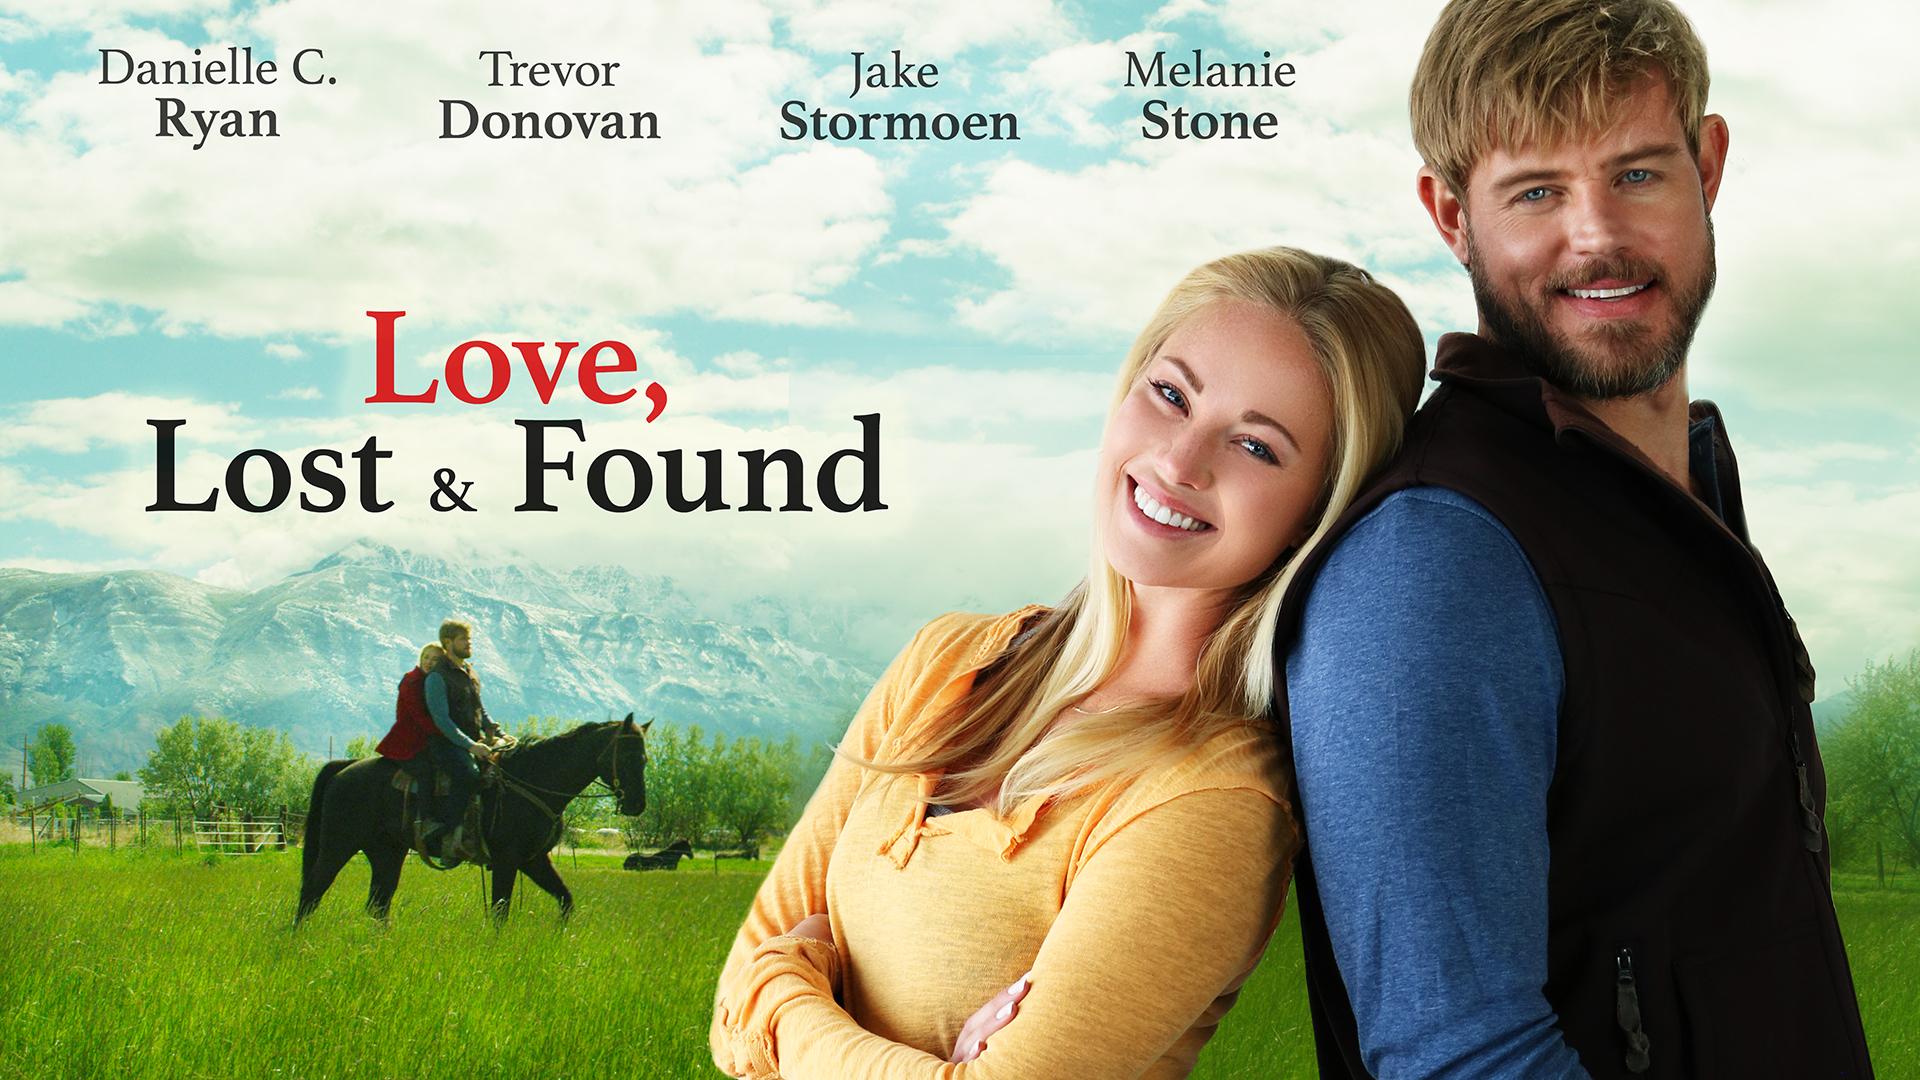 Love, Lost & Found